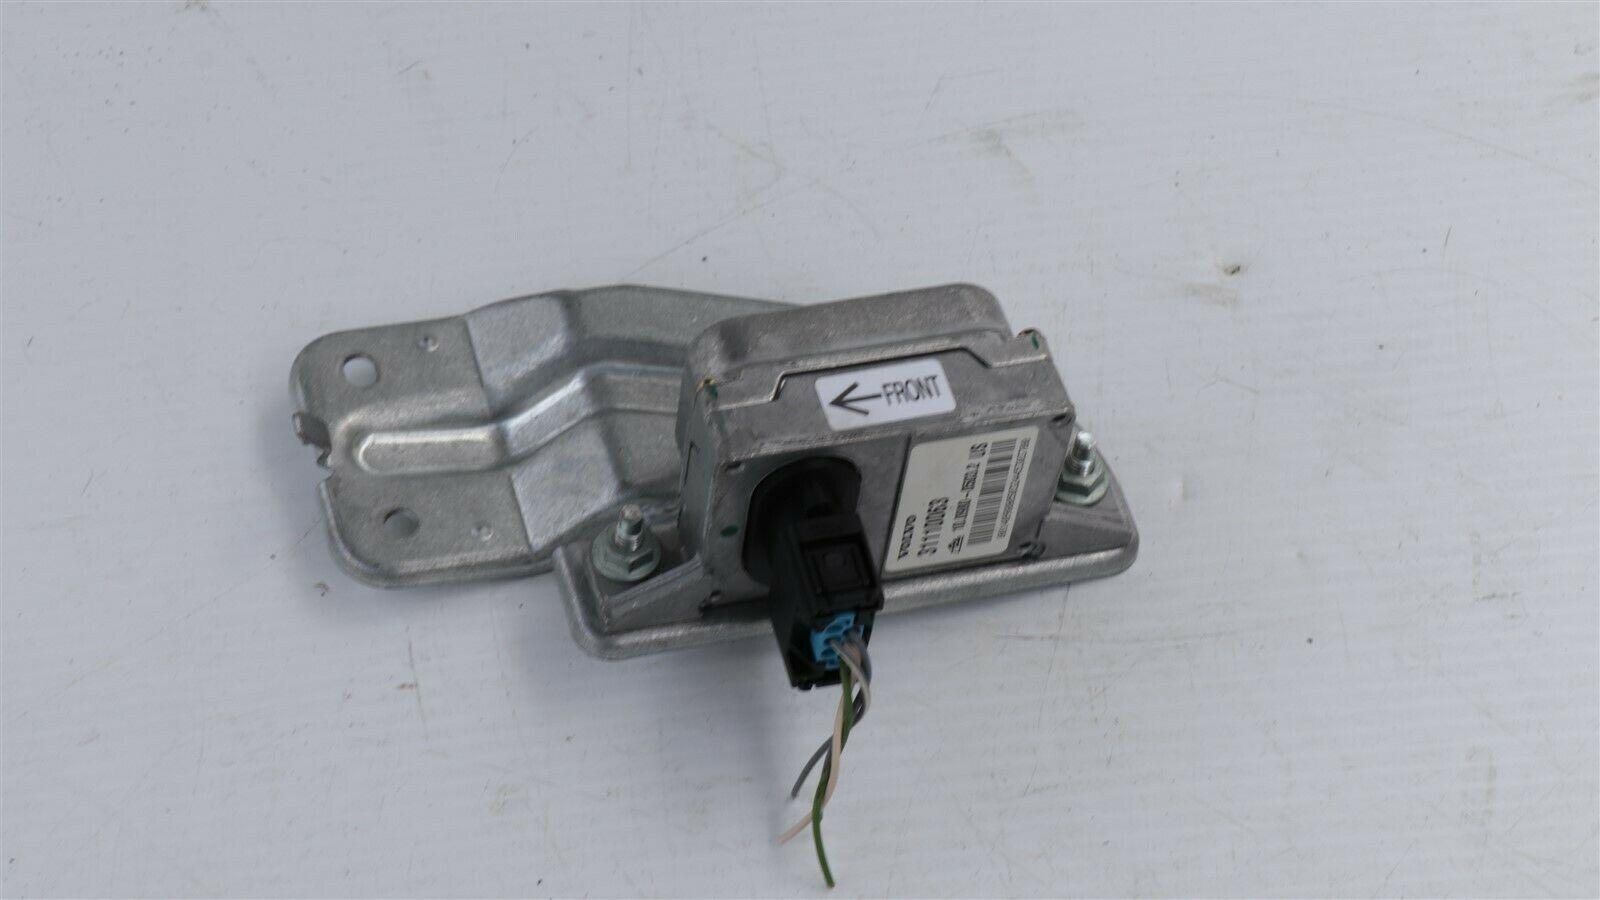 Volvo XC90 XC 90 Yaw Rate Sensor ABS Traction Control Module 8691675, 31110063